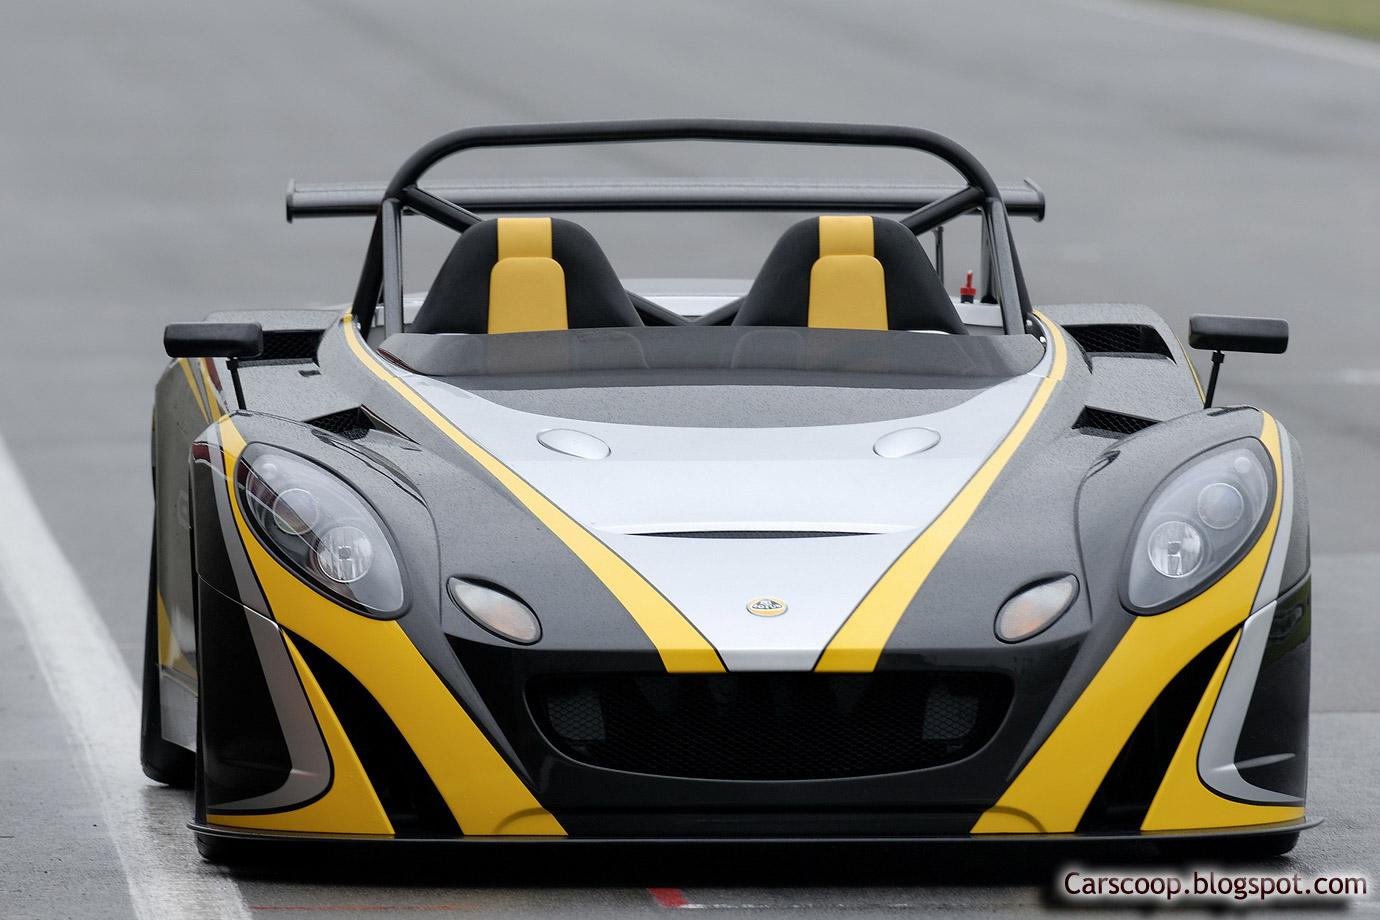 Carscoop Lotus 2 Eleven 7 Lotus 2 Eleven: 255Hp & 670kg Elise track version to debut at Geneva